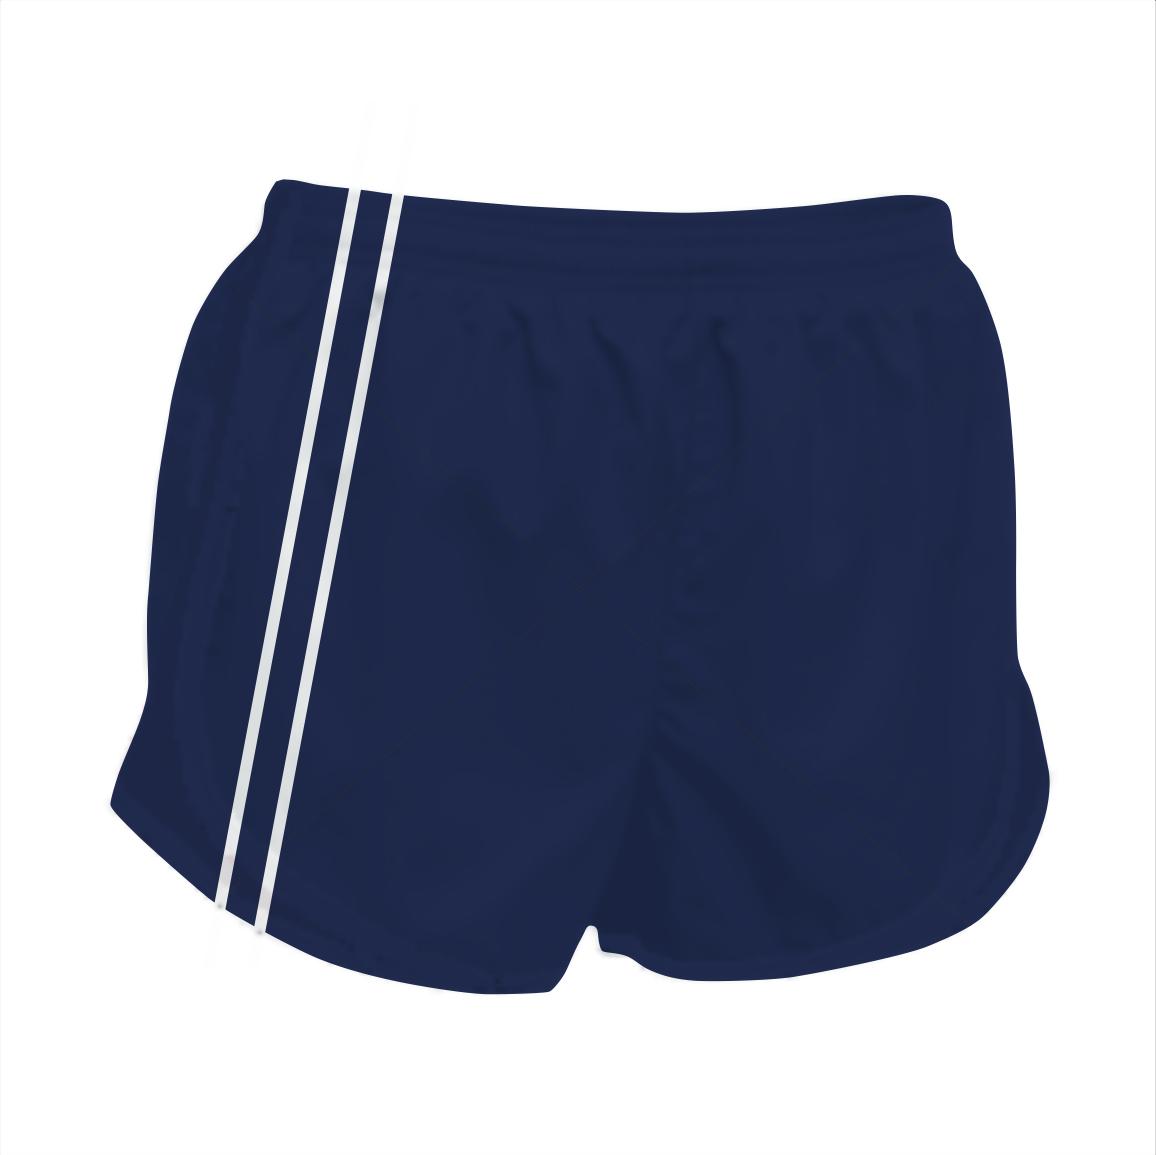 Panelled Zuco running shorts - Allyson